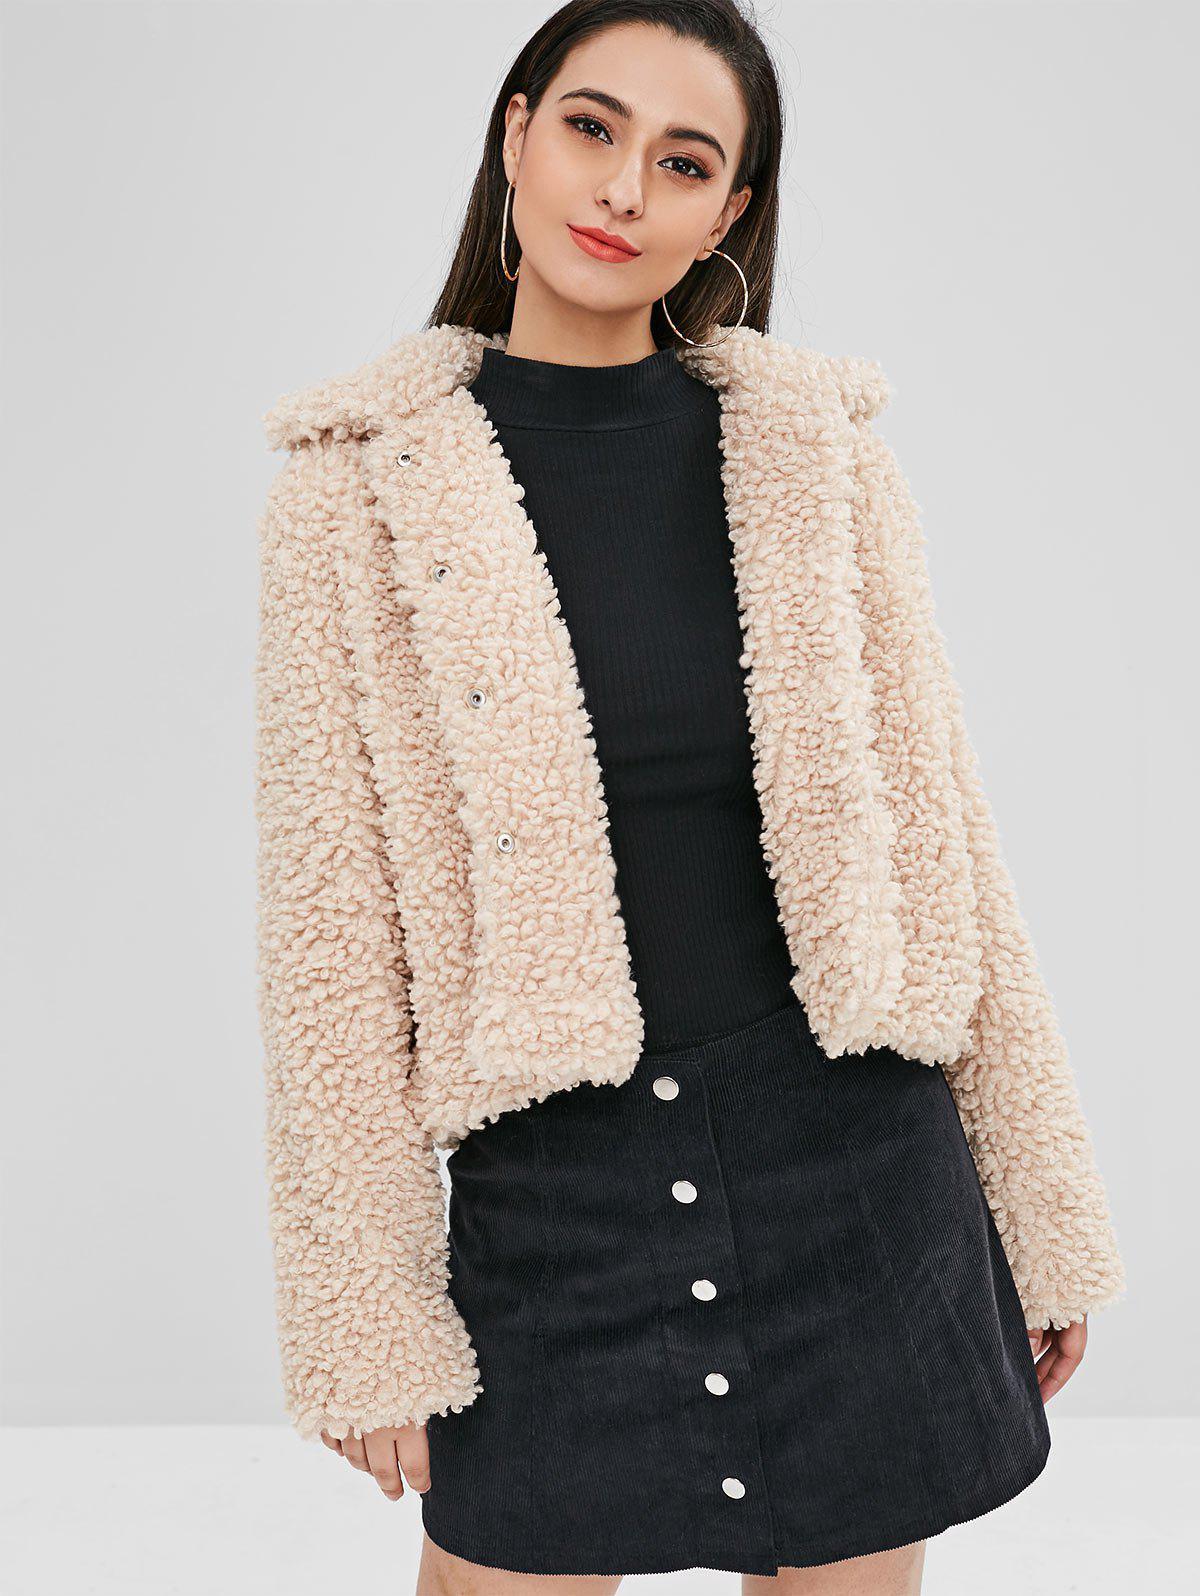 ZAFUL Fluffy Faux Fur Short Winter Teddy Coat